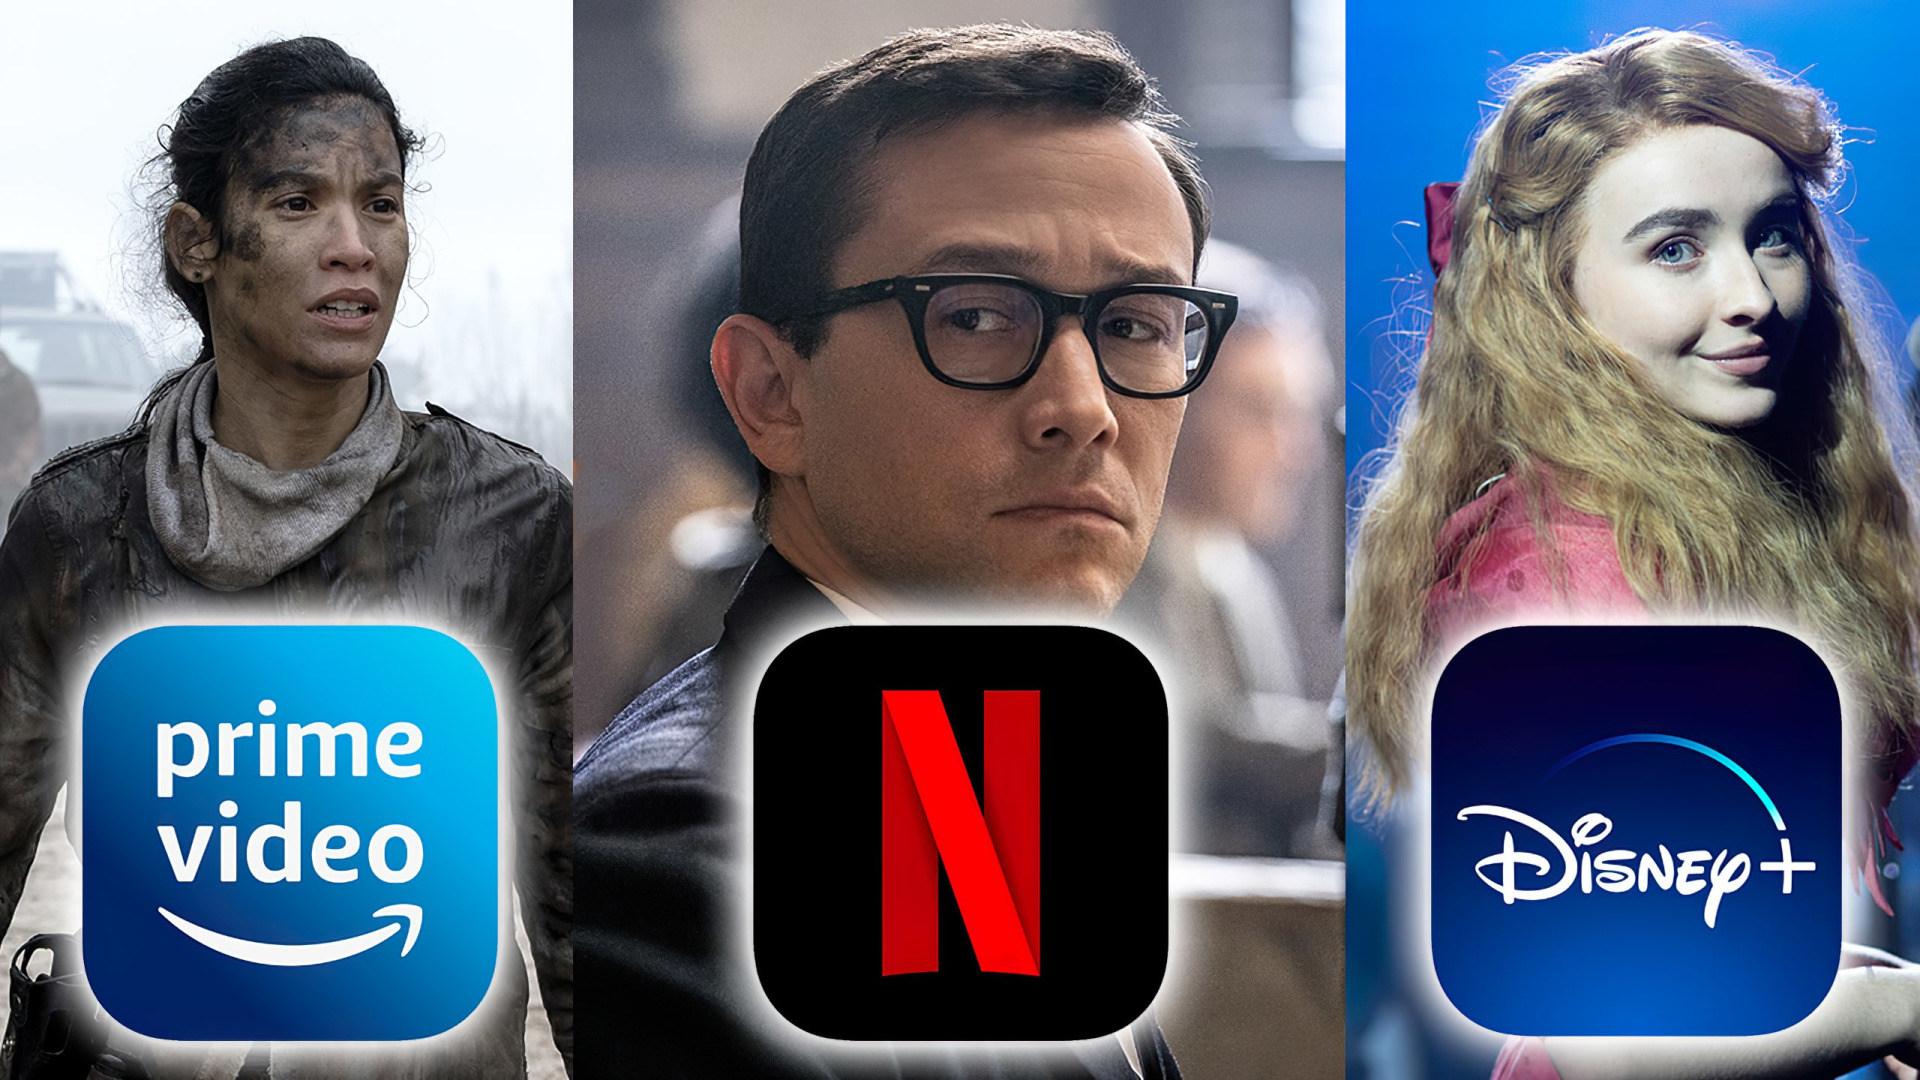 Streaming, Tv, Fernsehen, Netflix, Filme, Streamingportal, Serien, Videostreaming, Amazon Prime Video, Disney+, Kw 42, Video-Streaming-Dienst